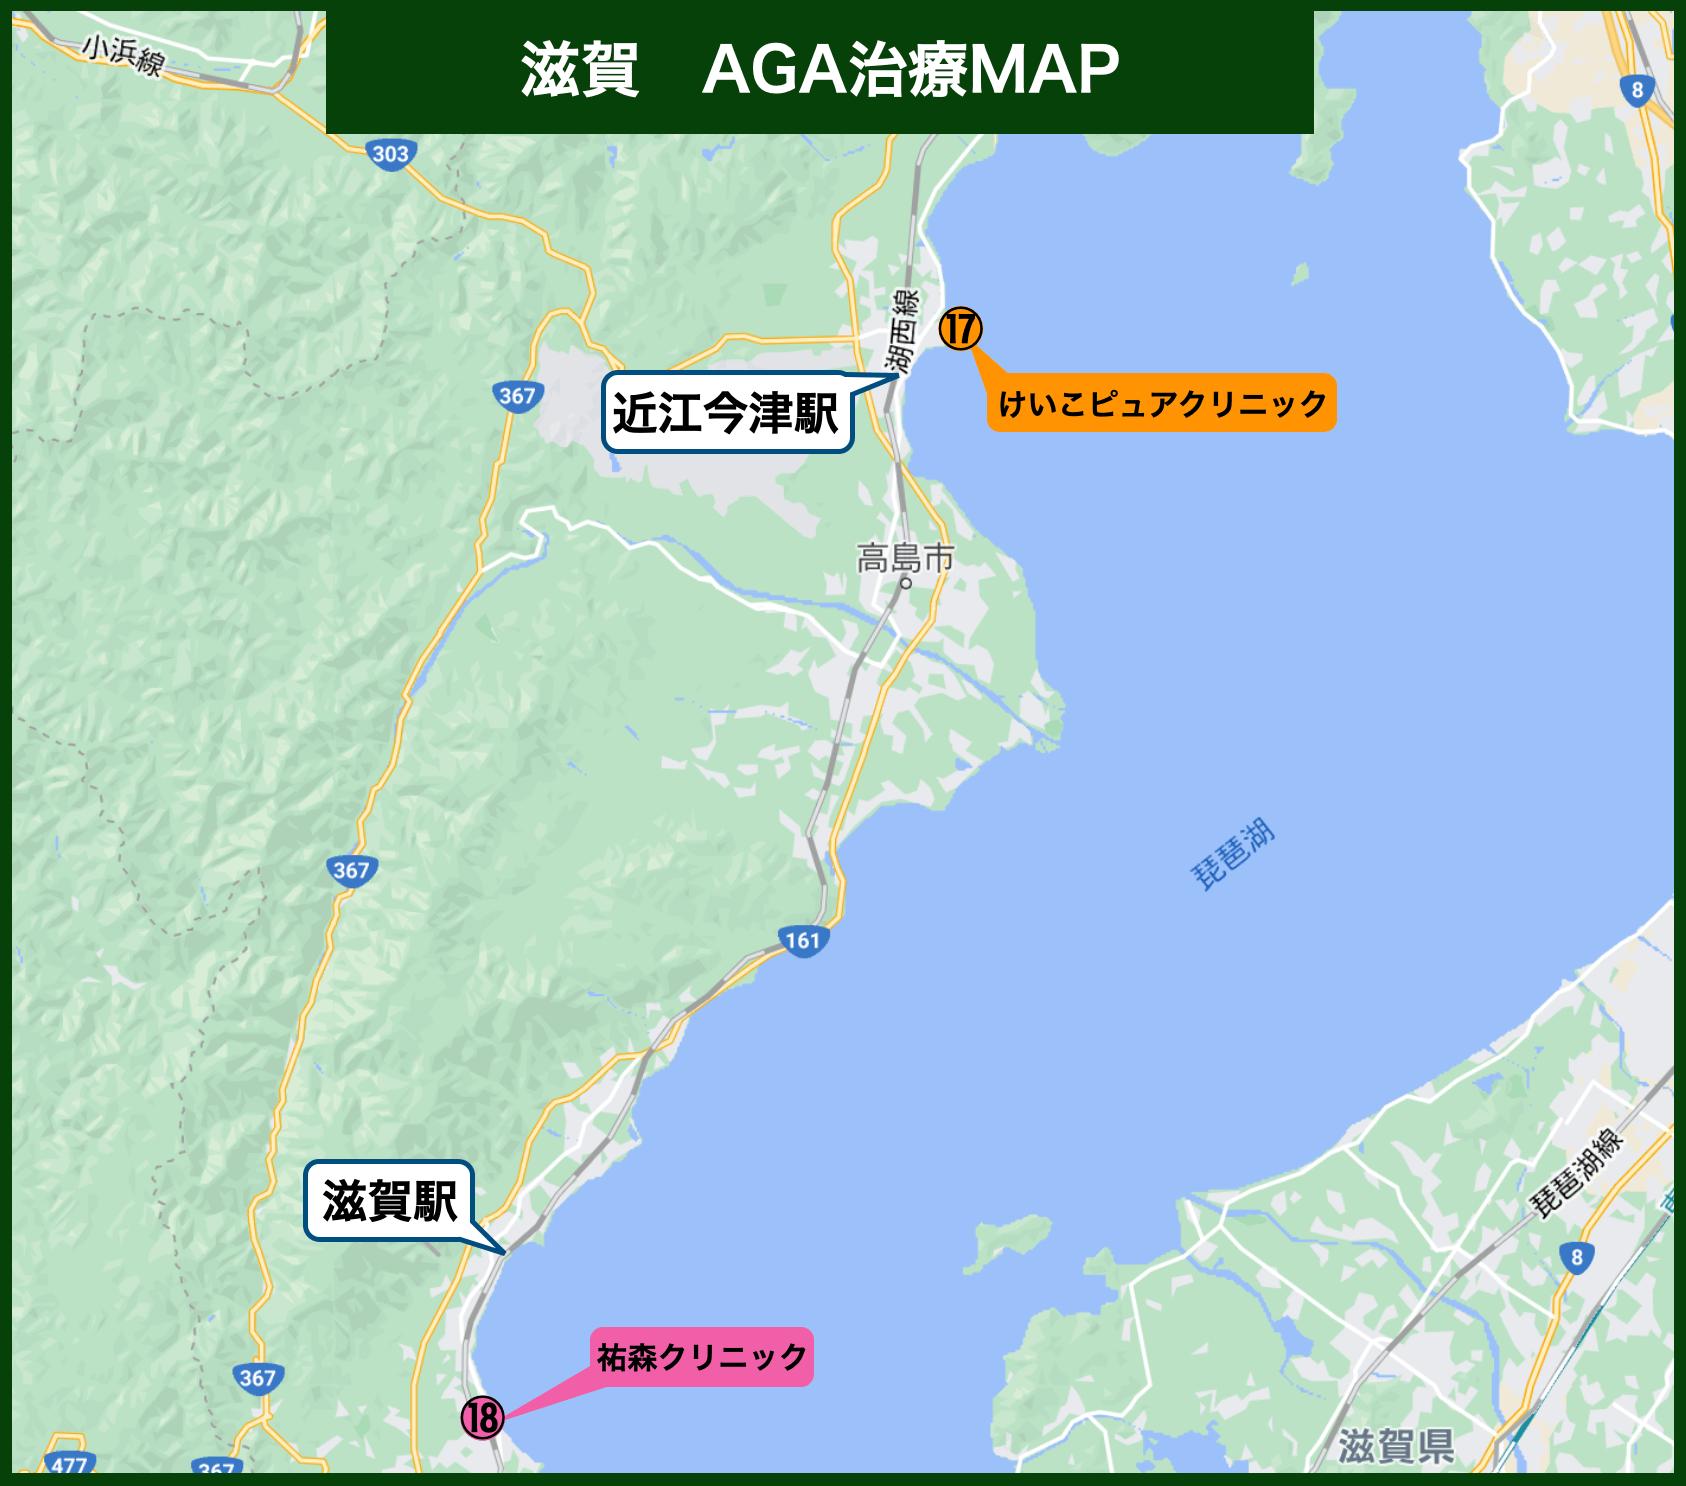 滋賀AGA治療MAP